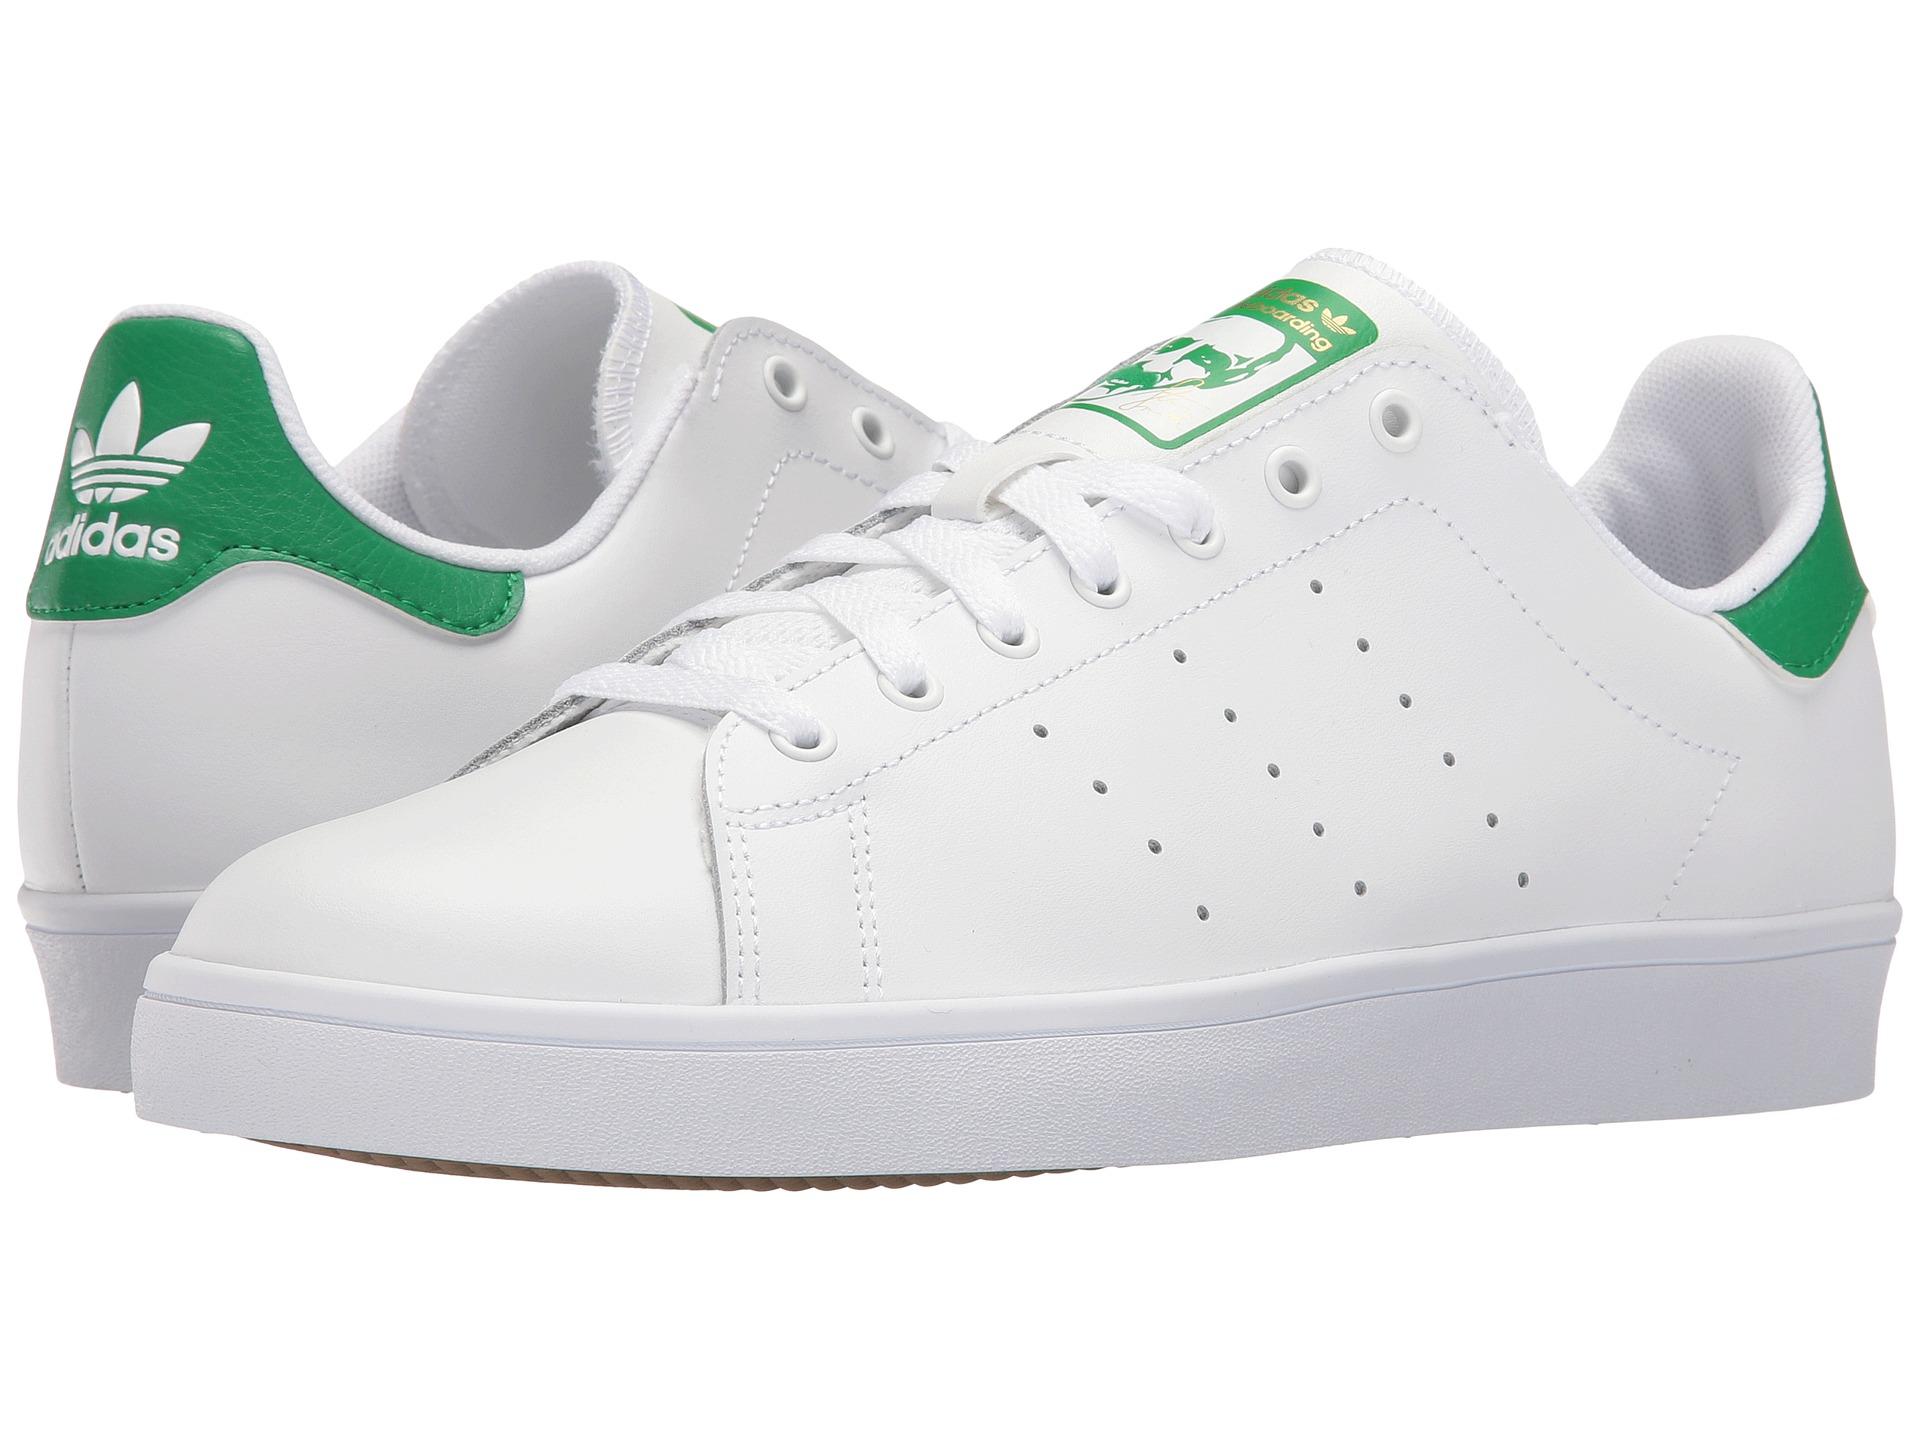 Adidas Stan Smith Shoe Size